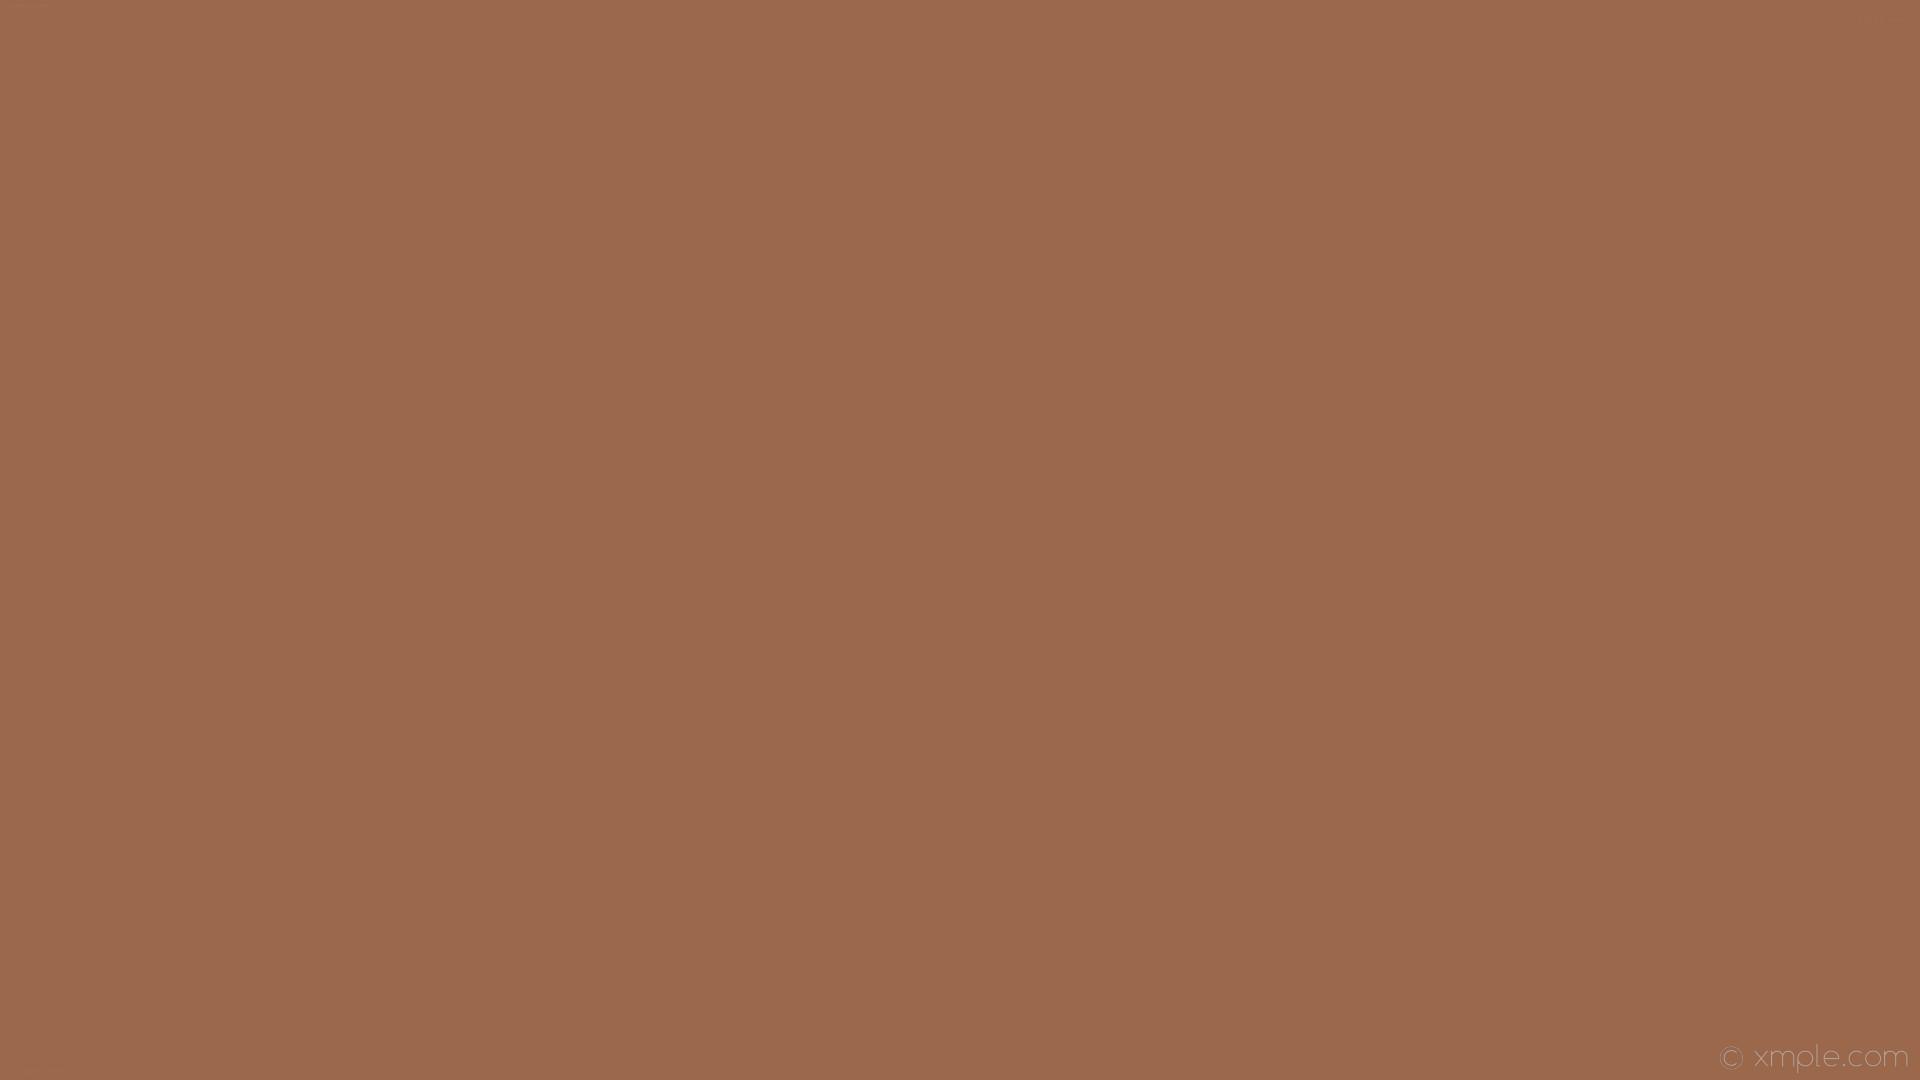 Solid Orange Wallpaper, HQ Definition Desktop Photos (45 ) | NM.CP .